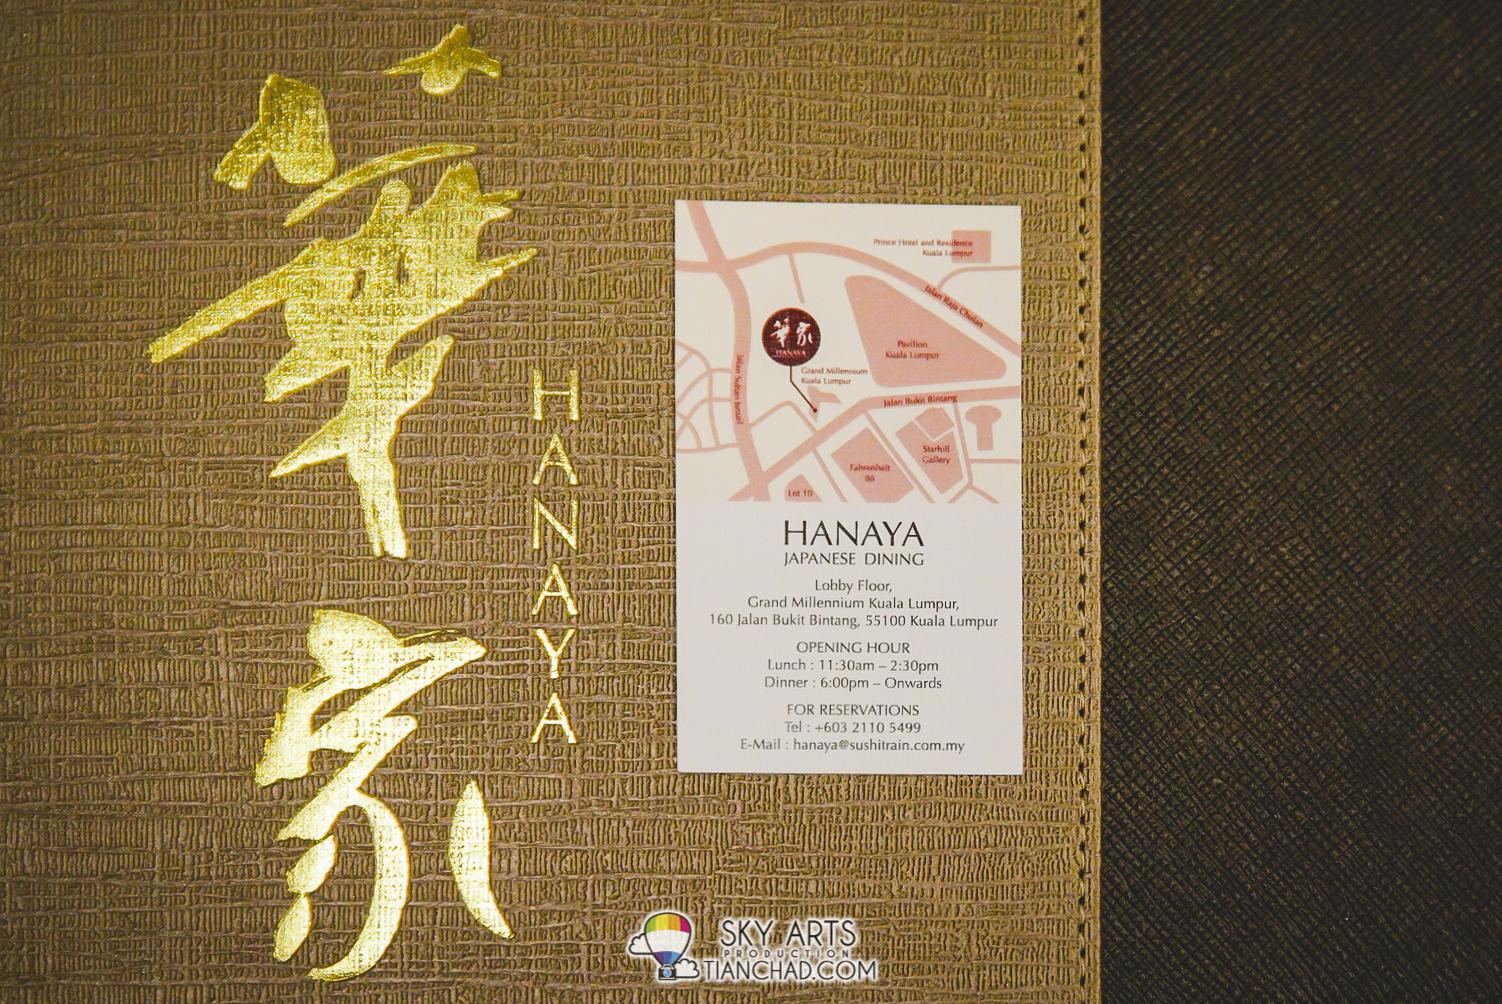 HANAYA 華家 Japanese Dining @ Grand Millenium Kuala Lumpur